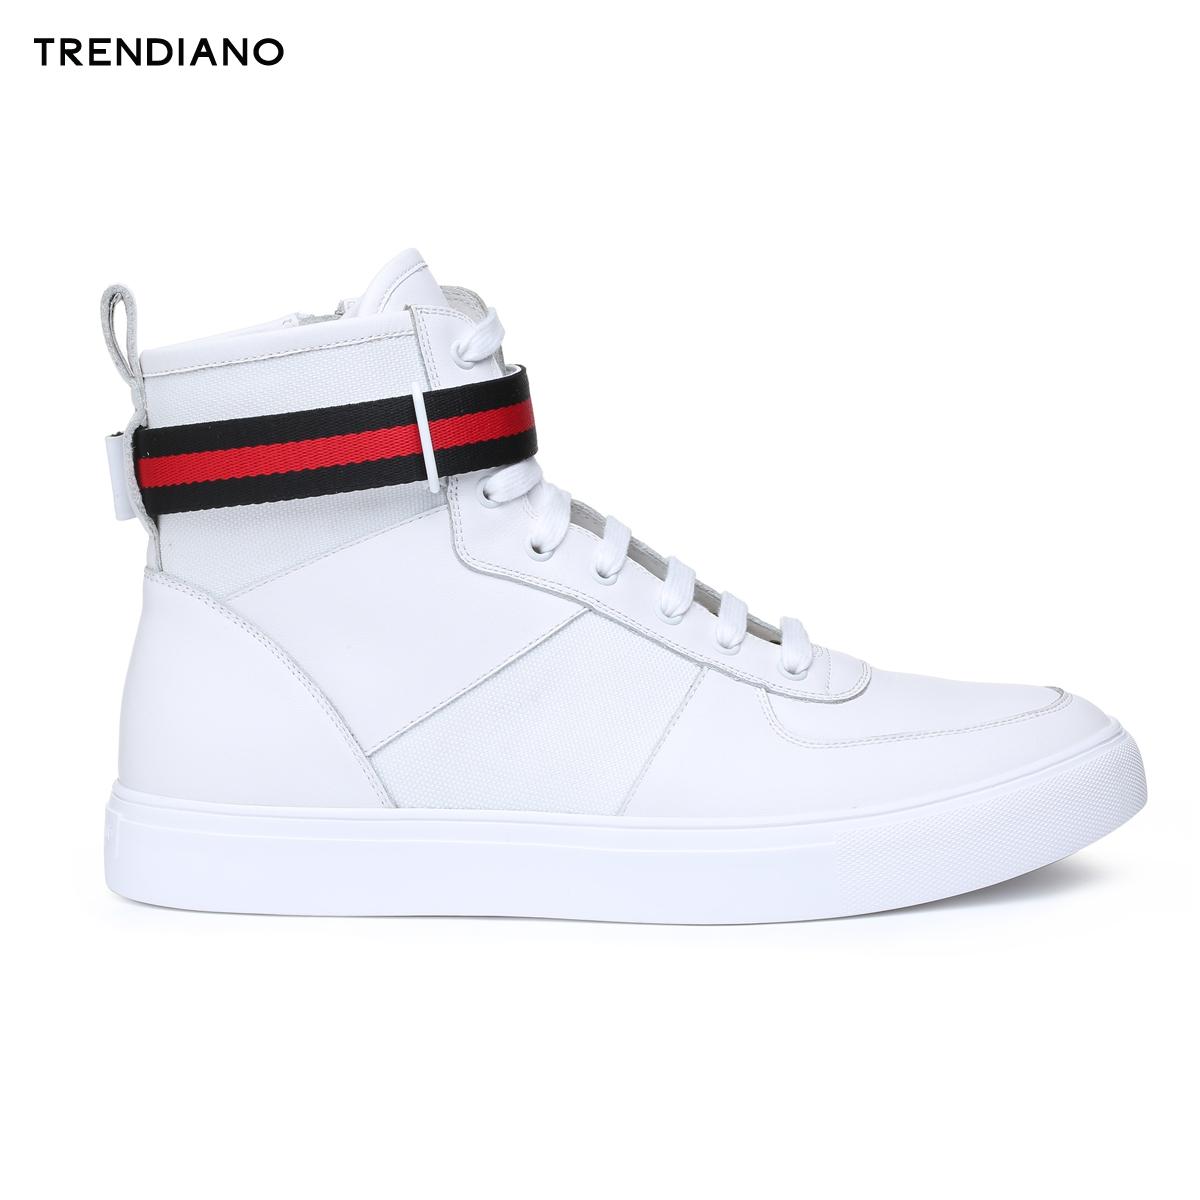 TRENDIANO新男装秋装休闲条纹织带撞色拼接系带高帮鞋3JA3518190